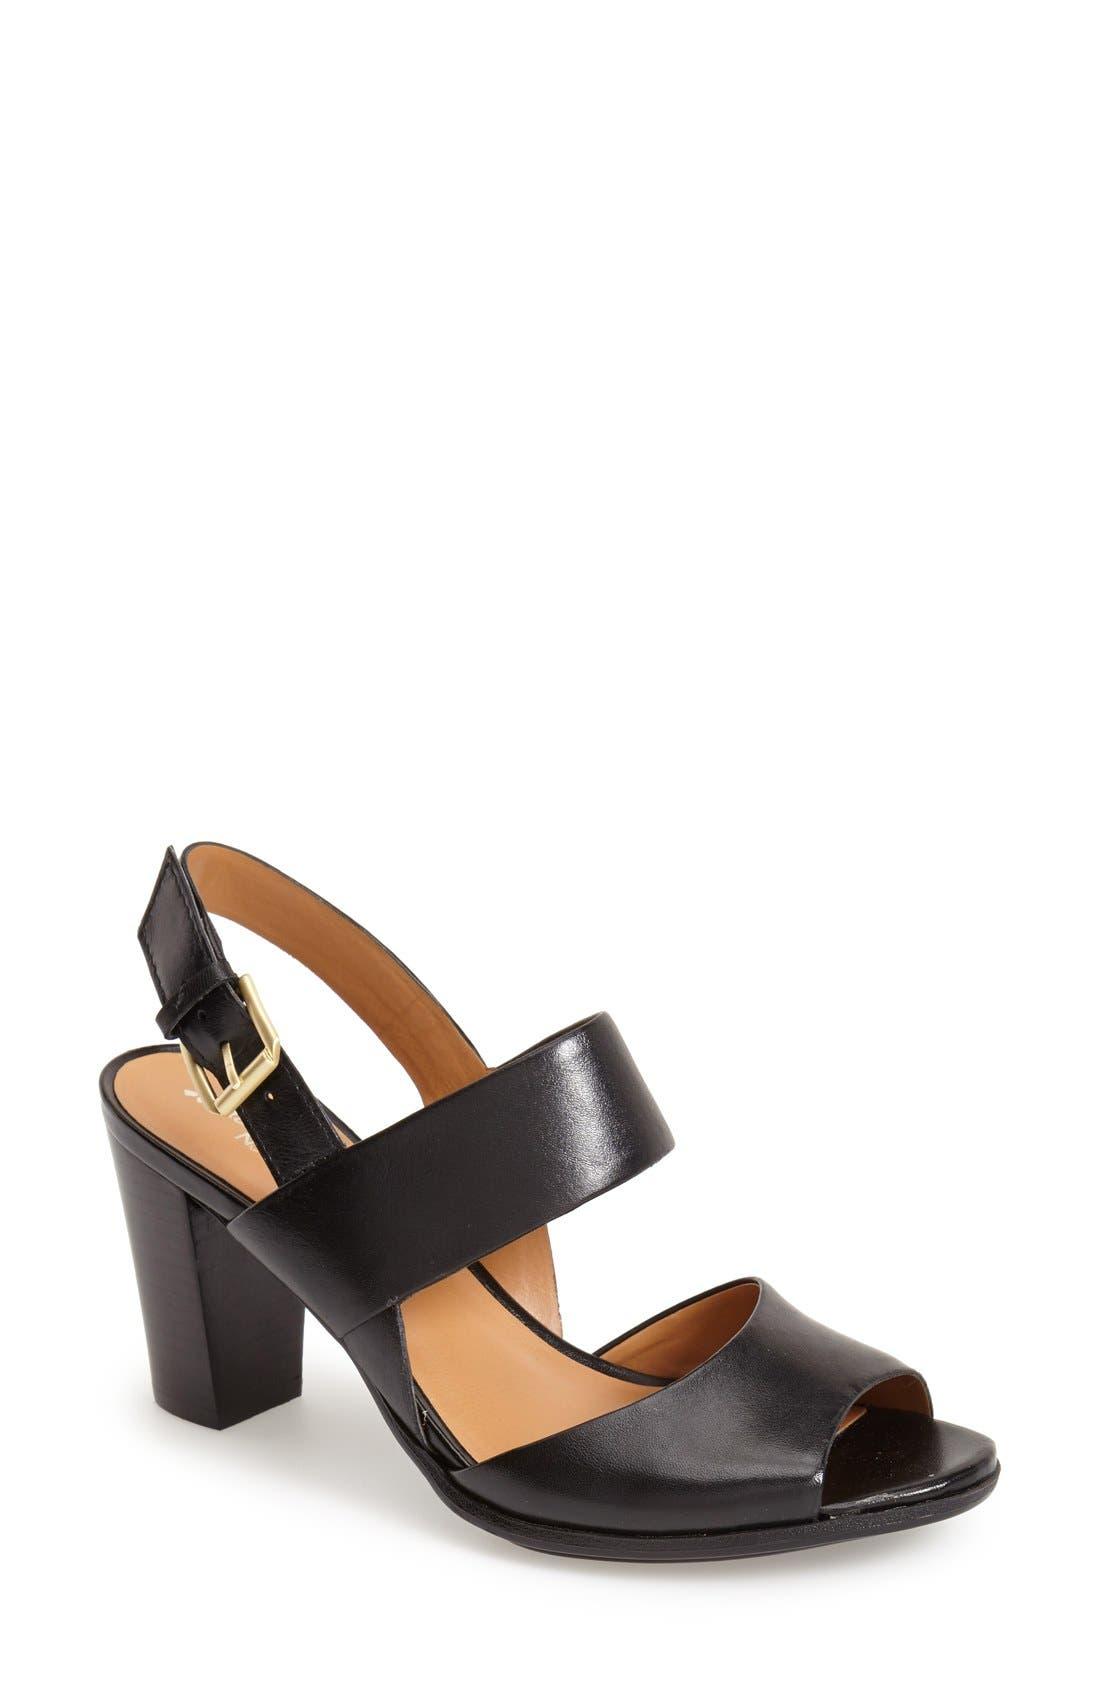 NATURALIZER 'Dahnny' Sandal, Main, color, 001